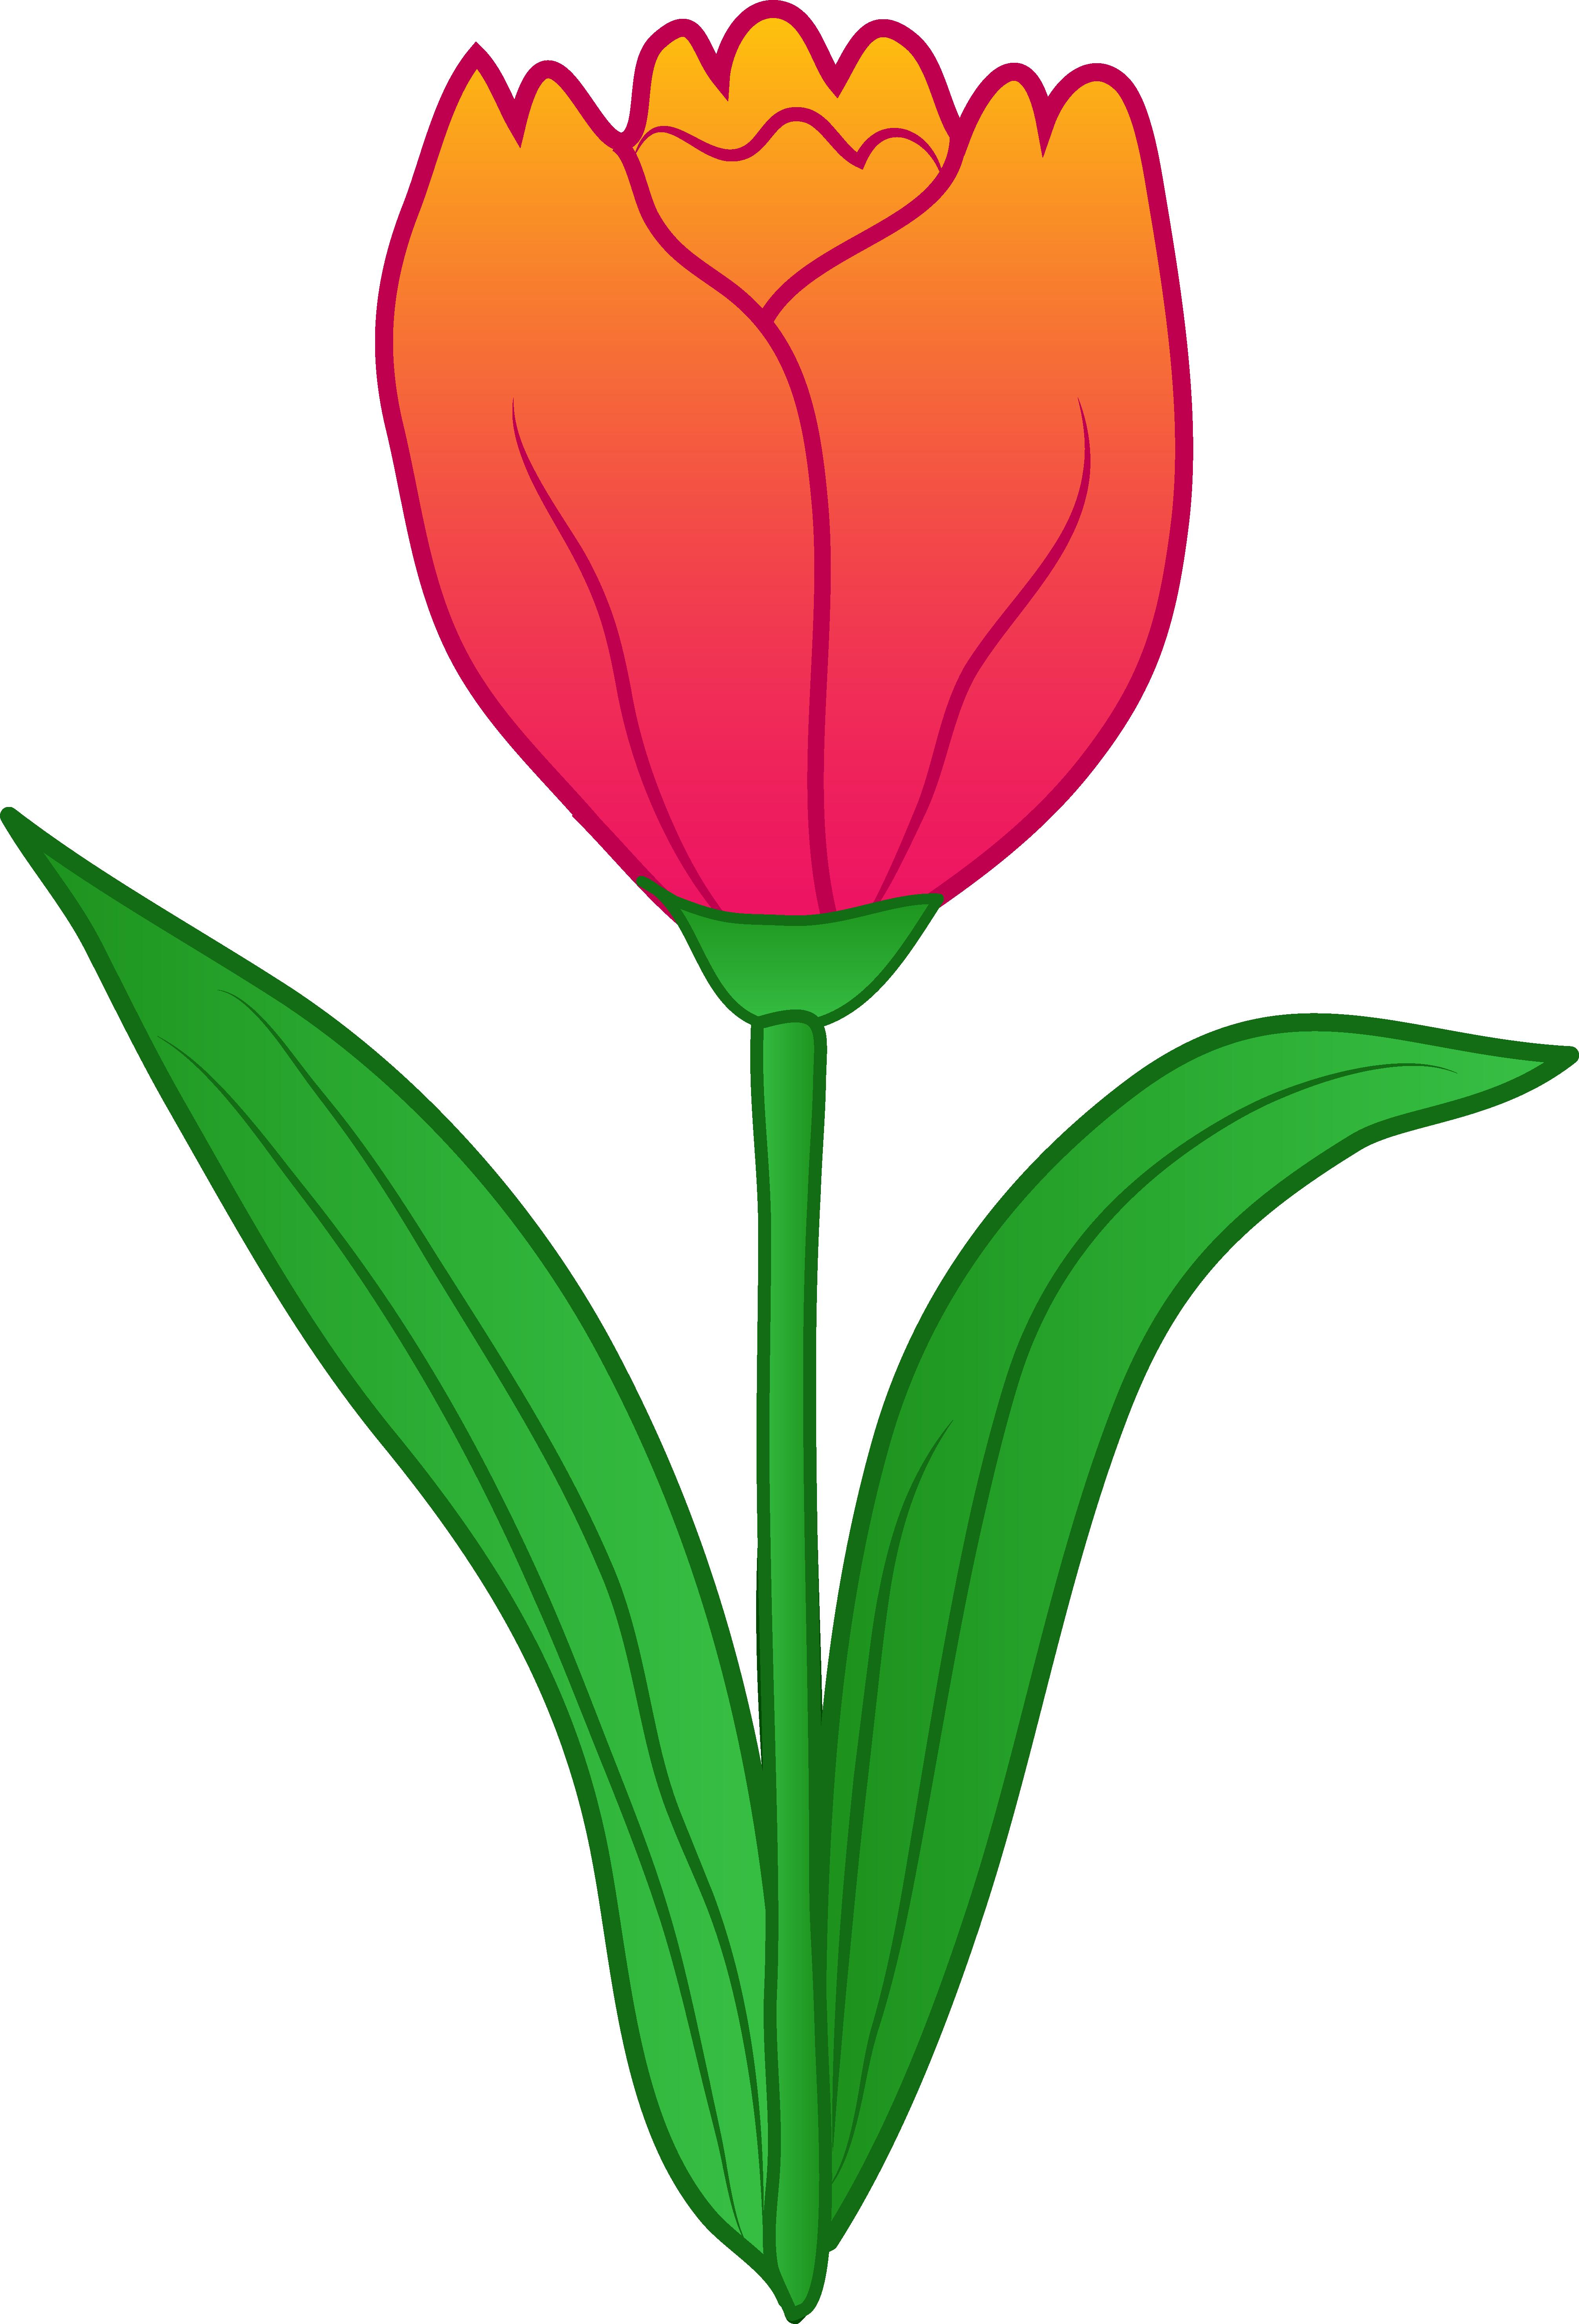 Free Free Tulip Clipart, Download Free Clip Art, Free Clip.